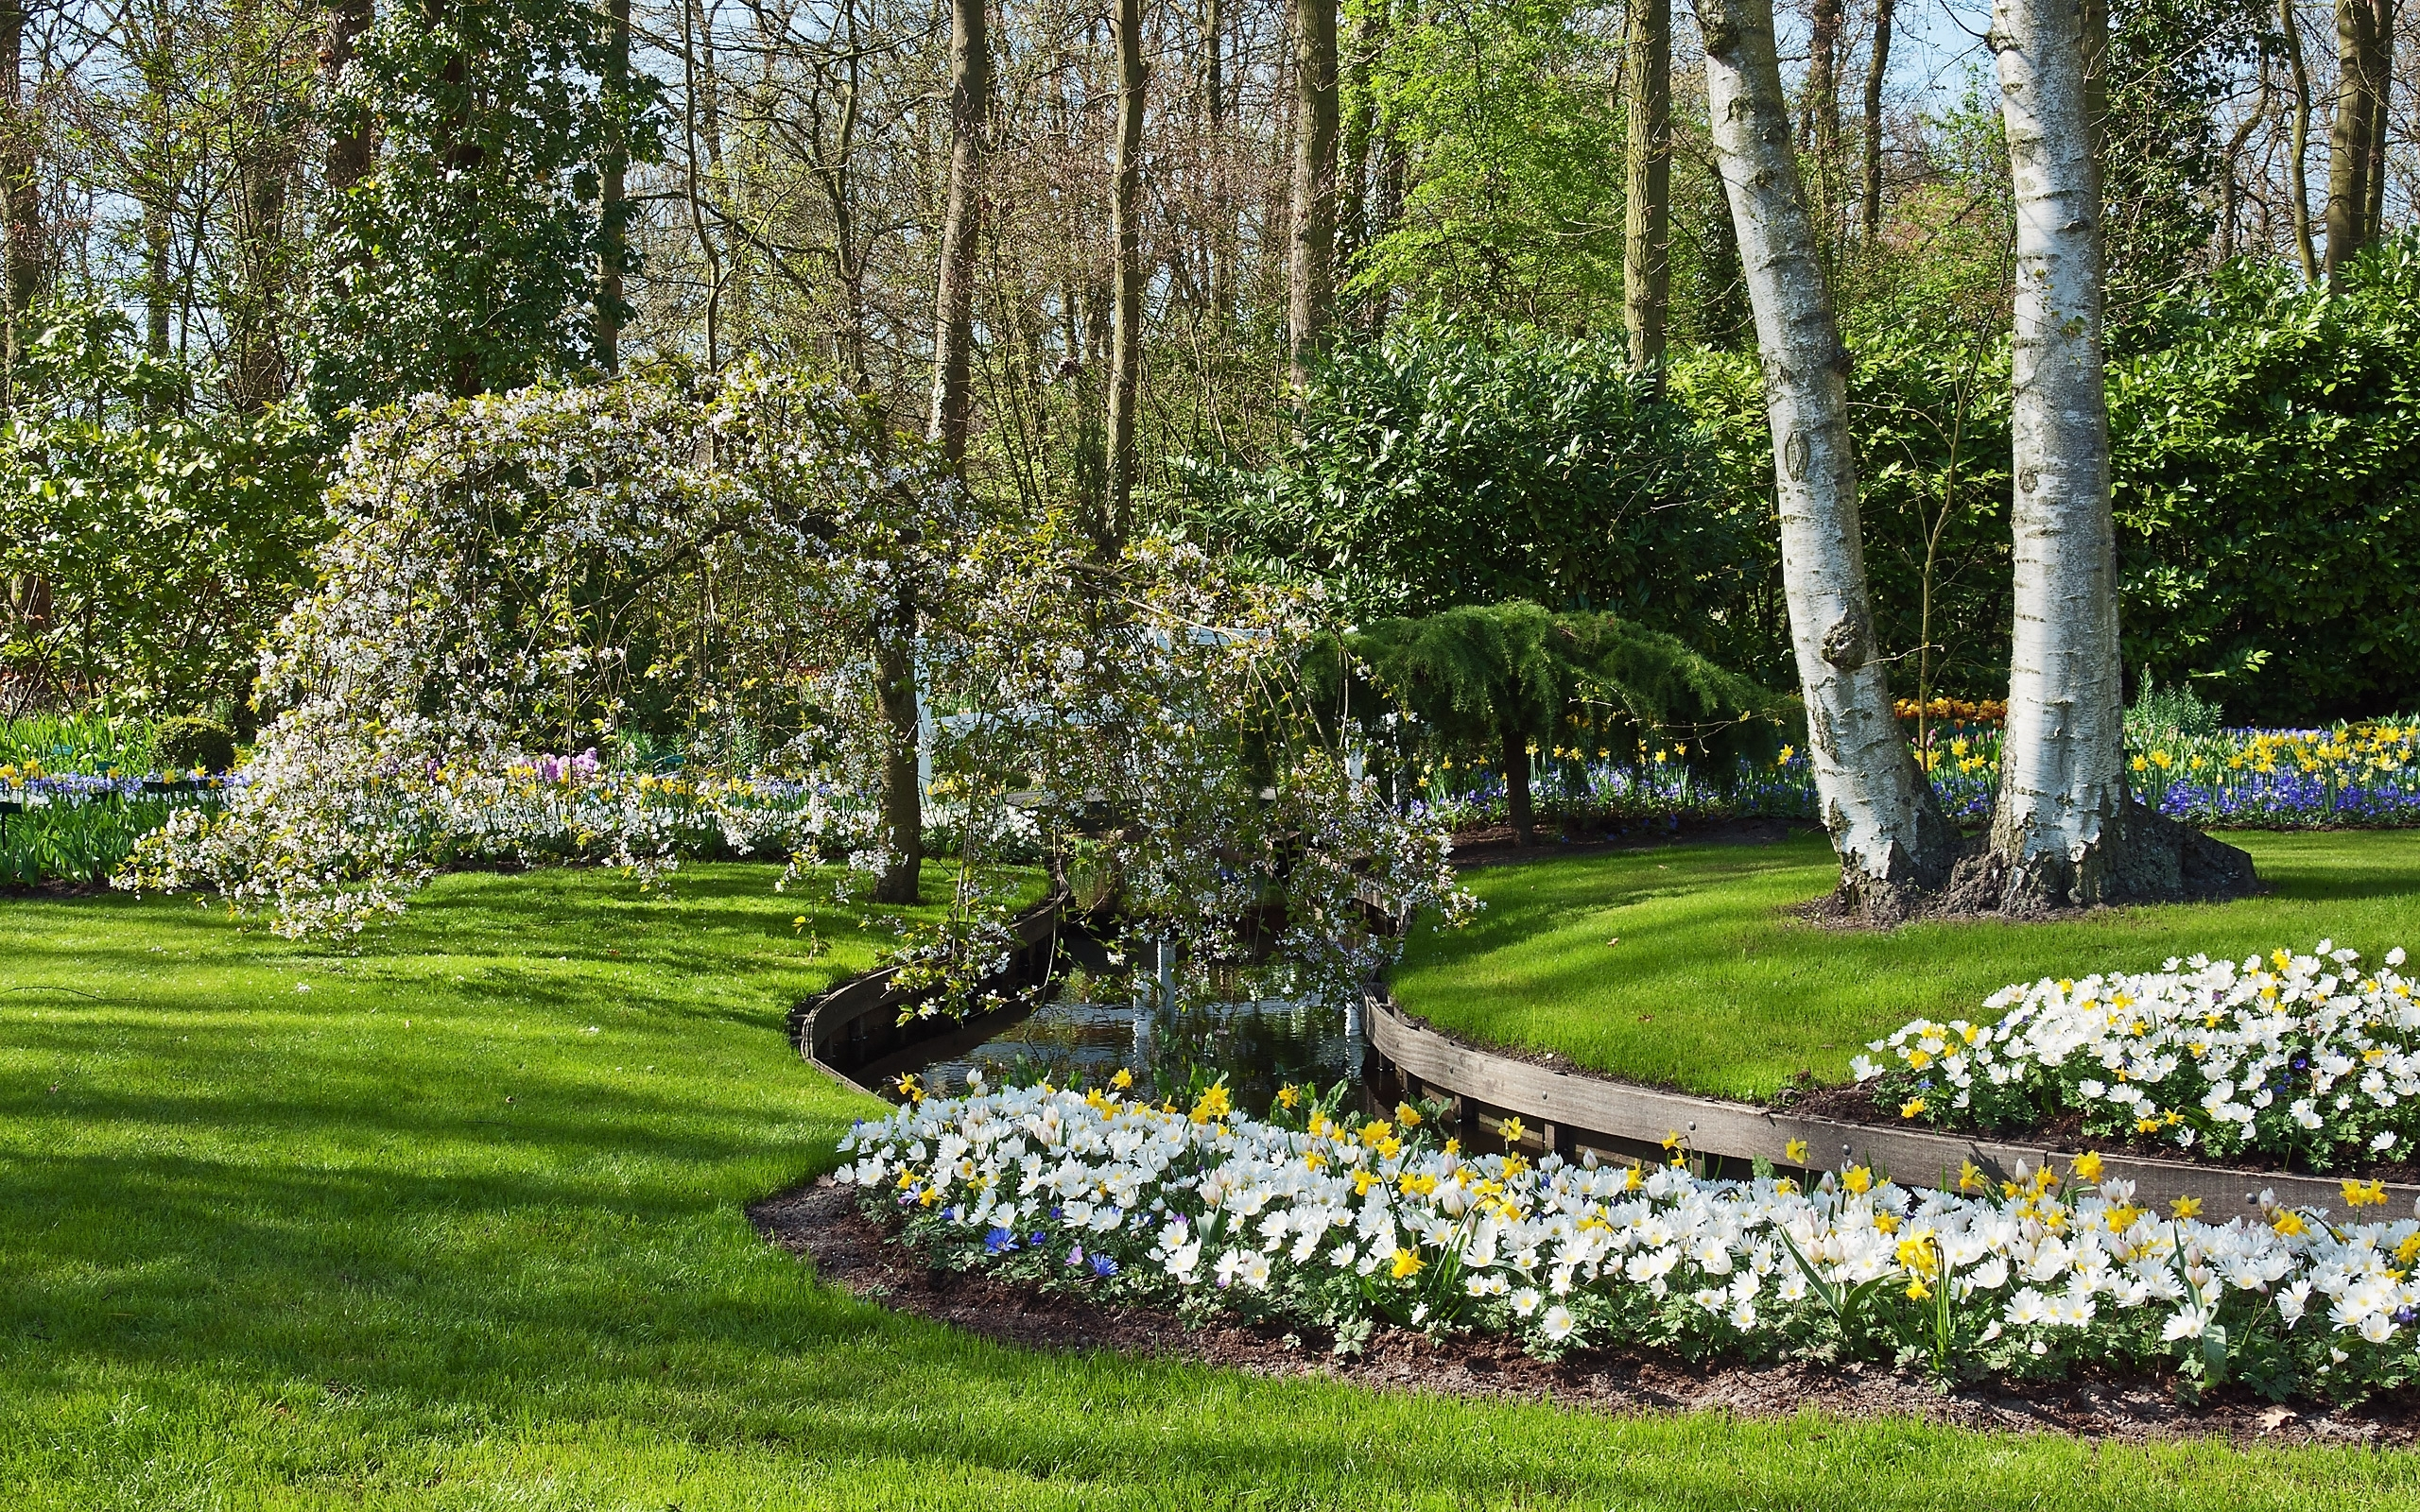 23395 descargar fondo de pantalla Paisaje, Flores, Árboles, Hierba, Arbusto: protectores de pantalla e imágenes gratis